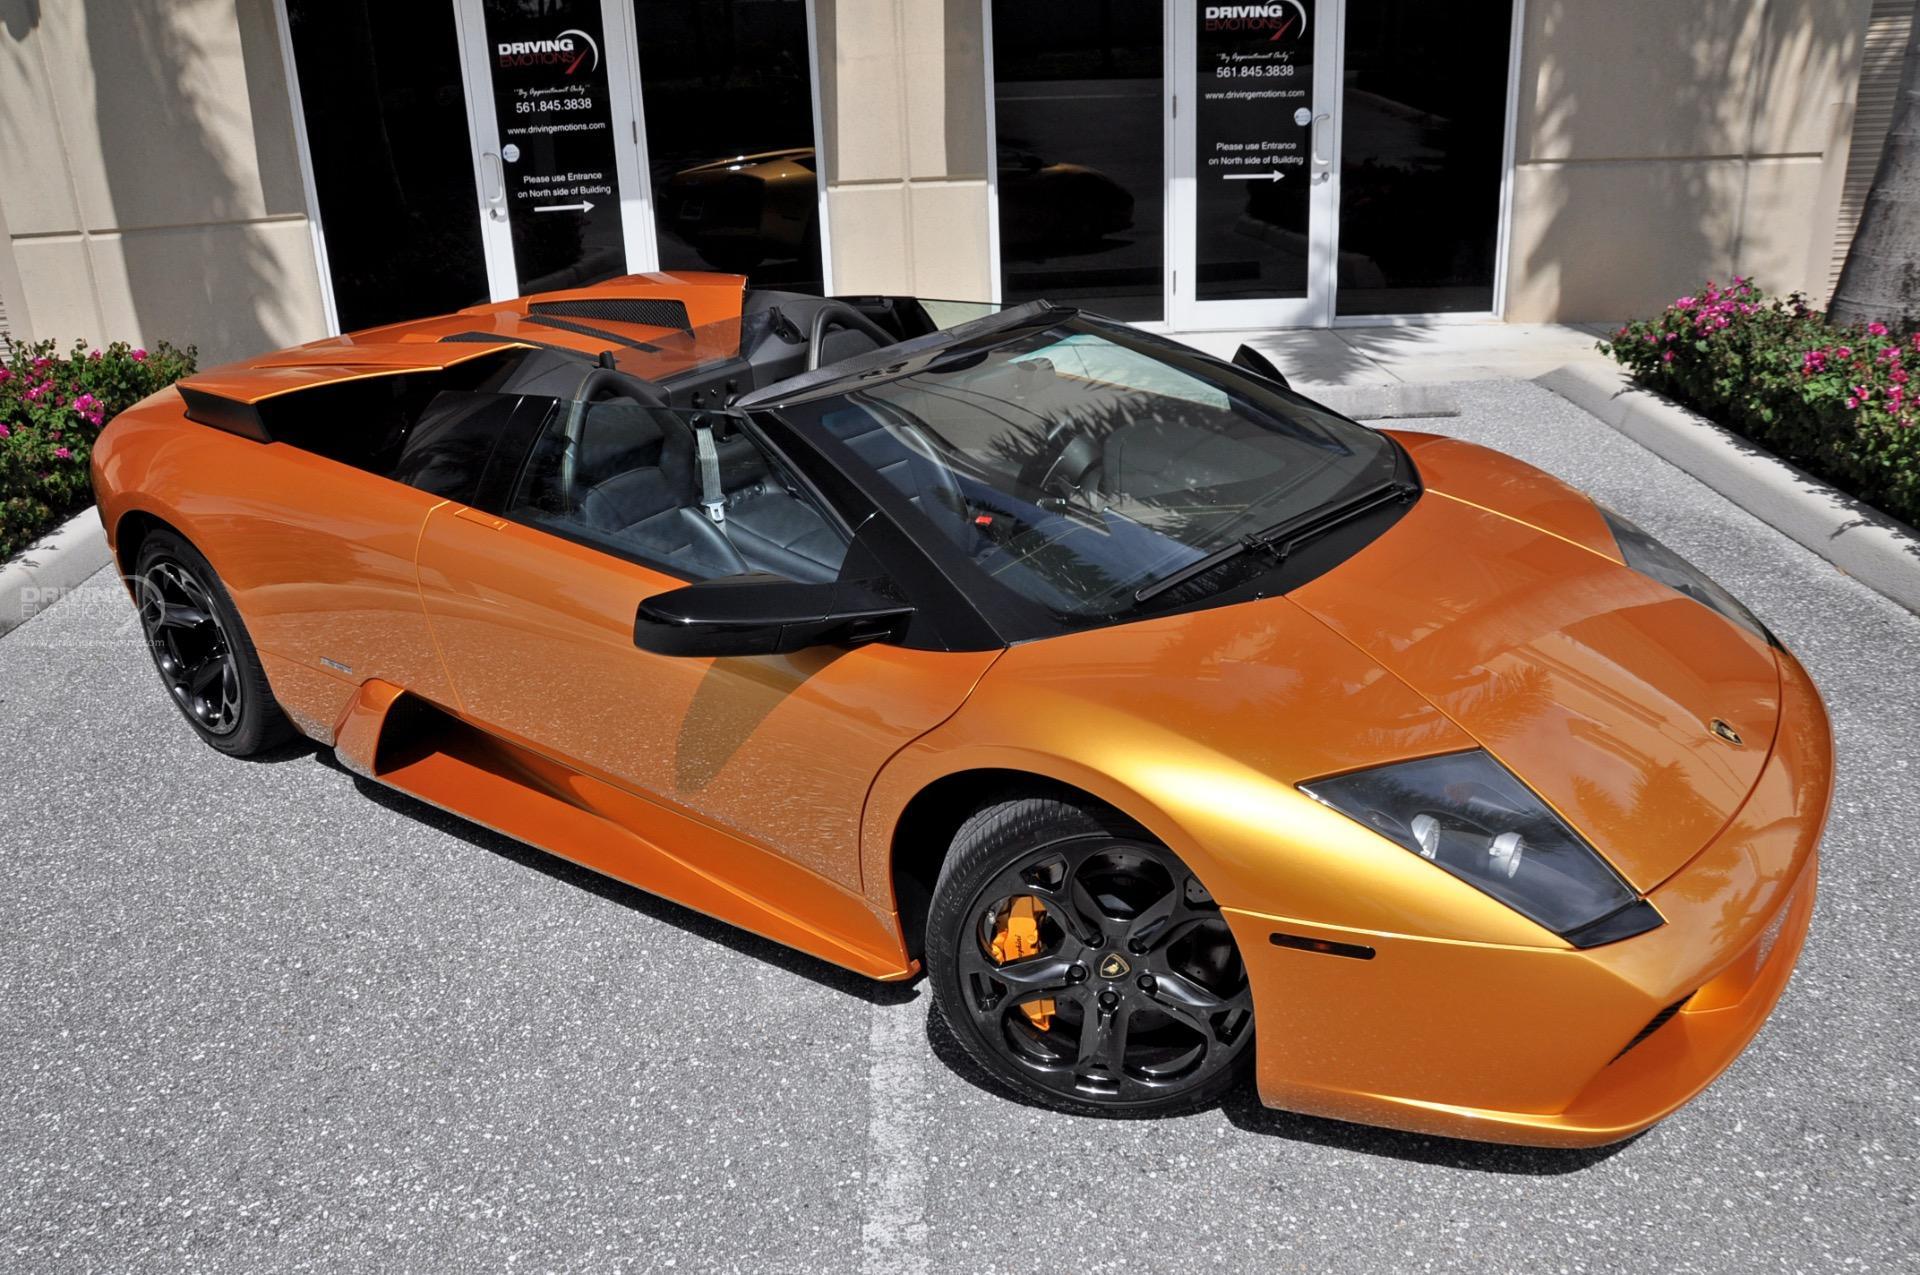 2005 Lamborghini Murcielago For Sale 199 900 1469024